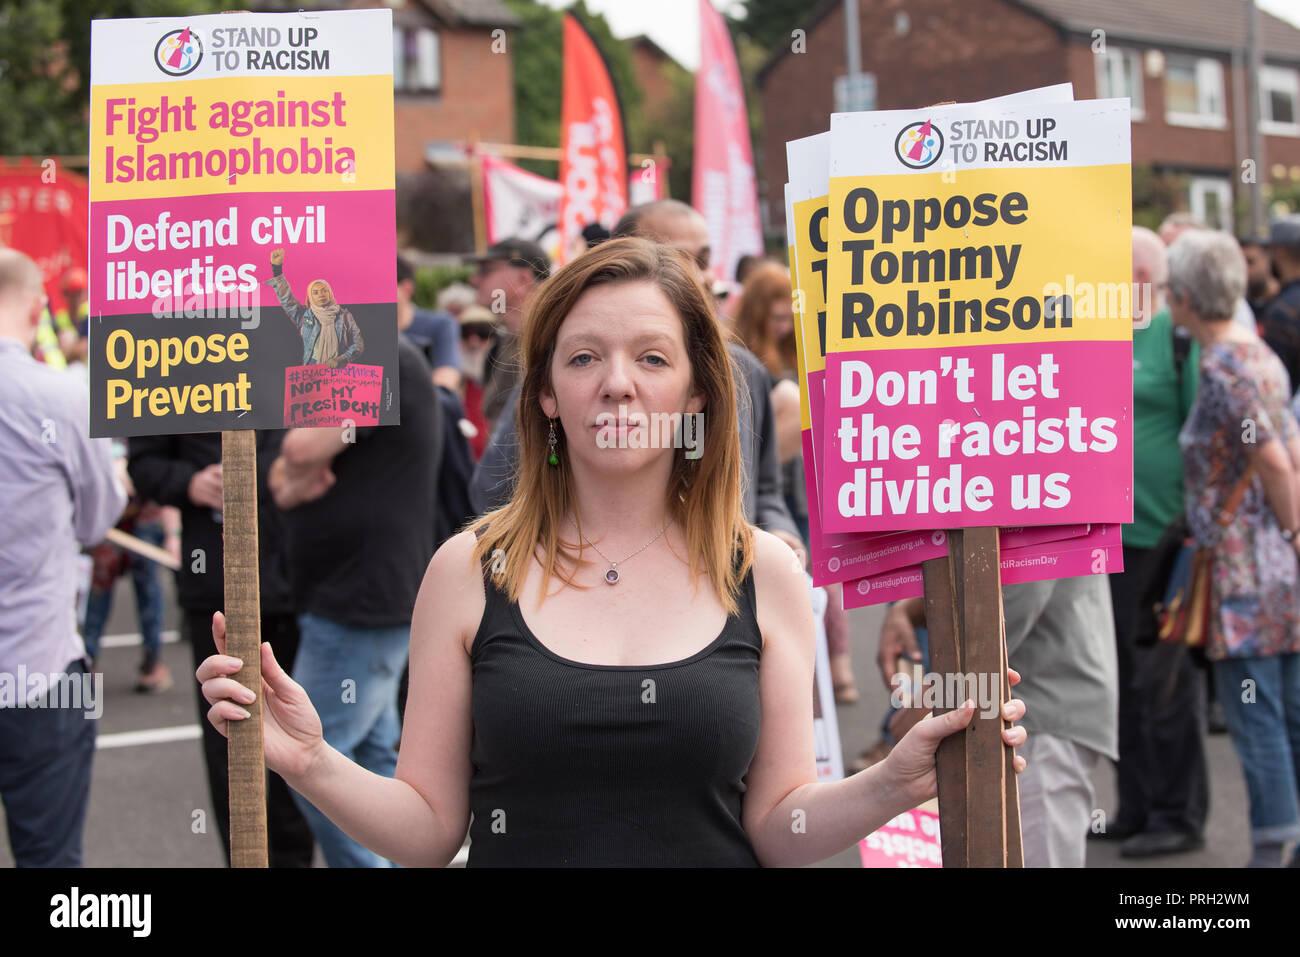 Anti racism campaigner - Stock Image